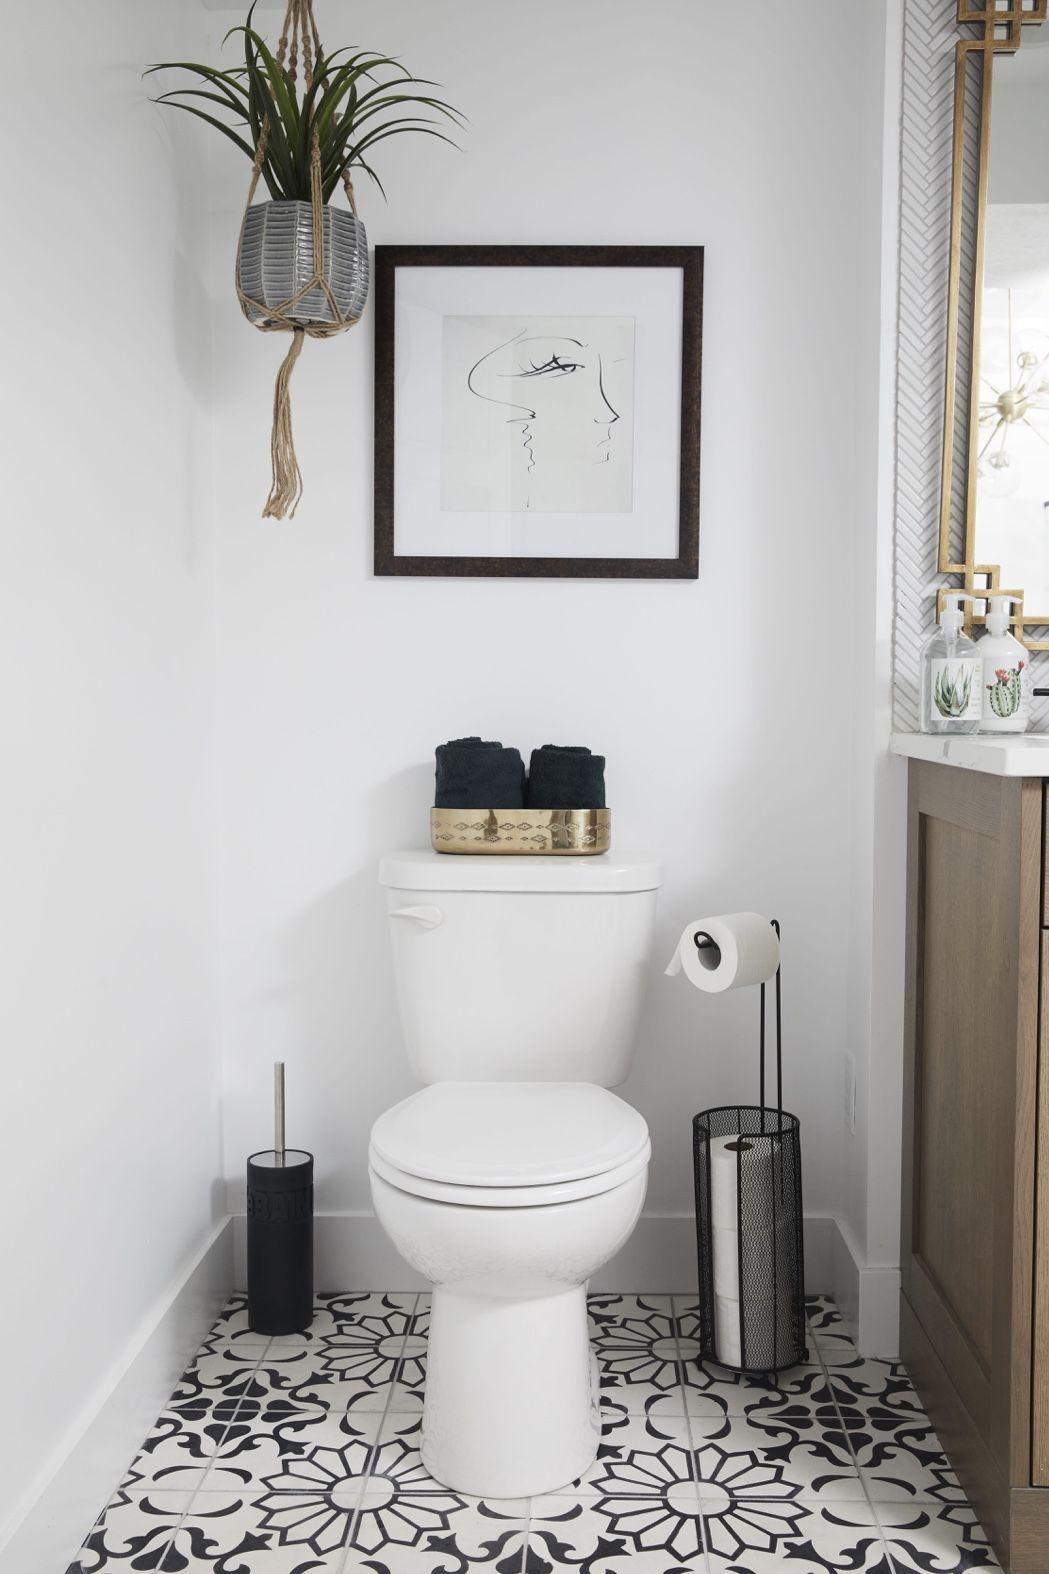 Pin by lindsey cherrington on h o m e in pinterest bathroom